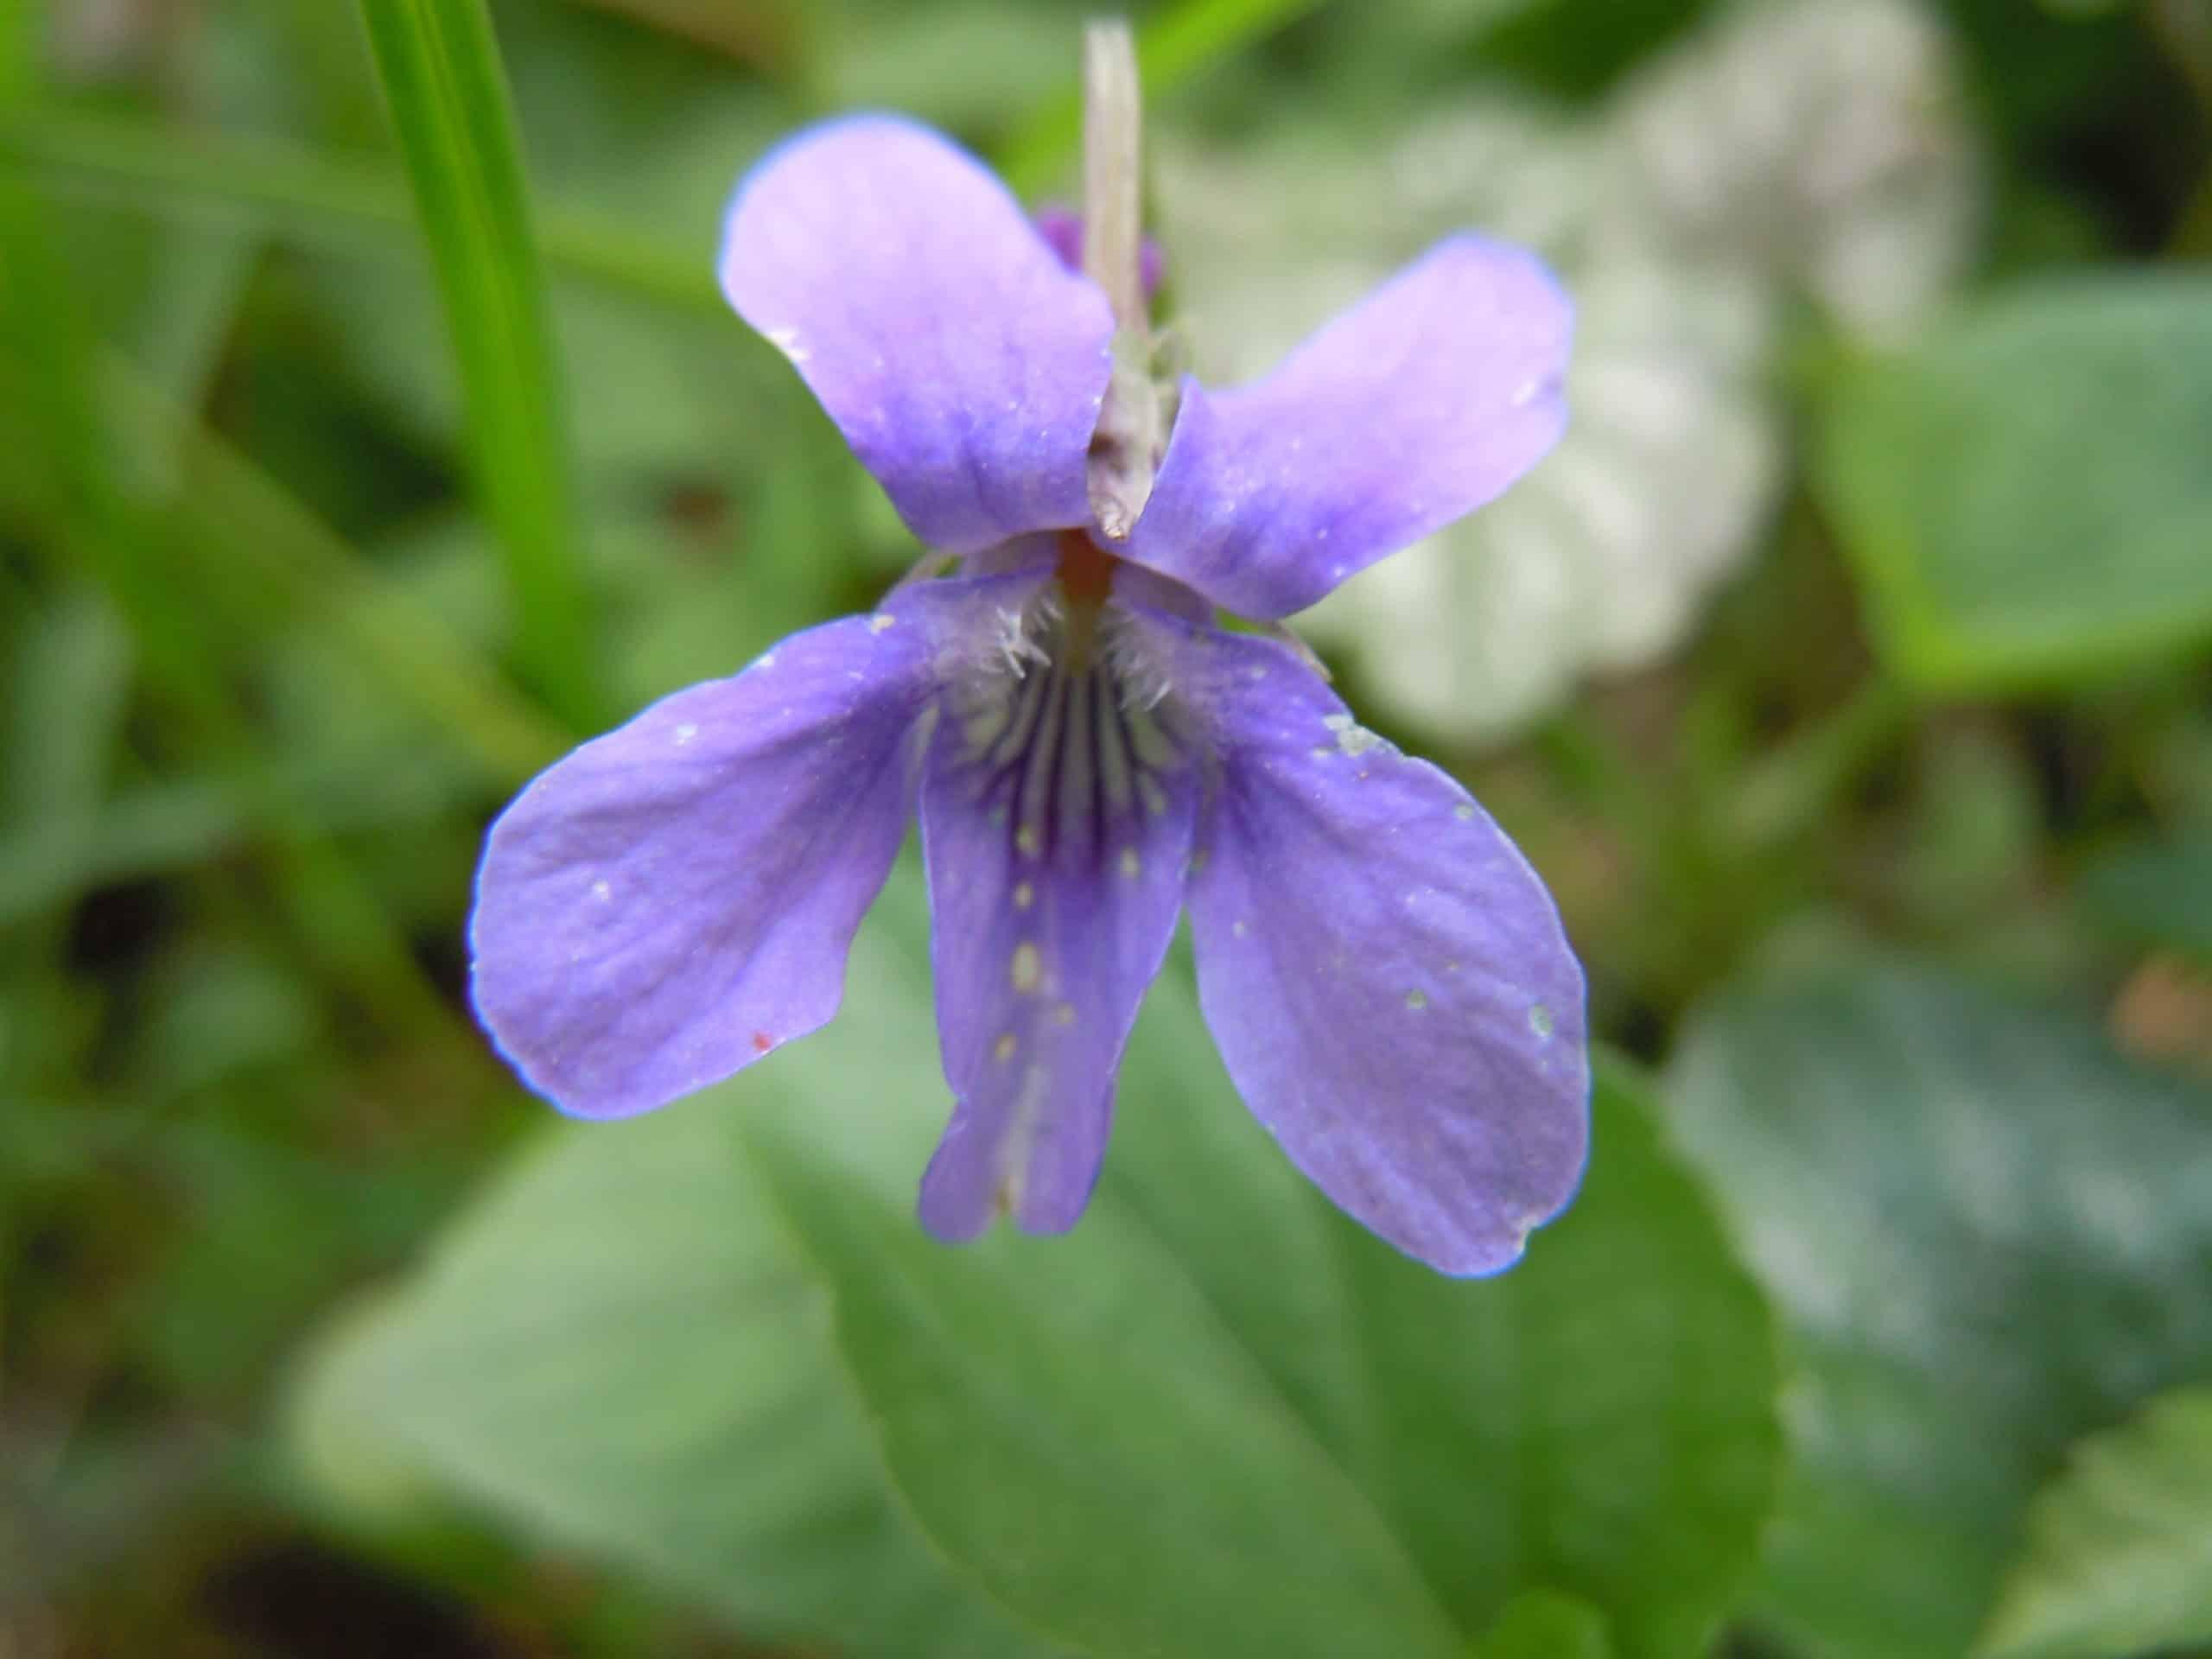 Violet. (Violaceae Family).